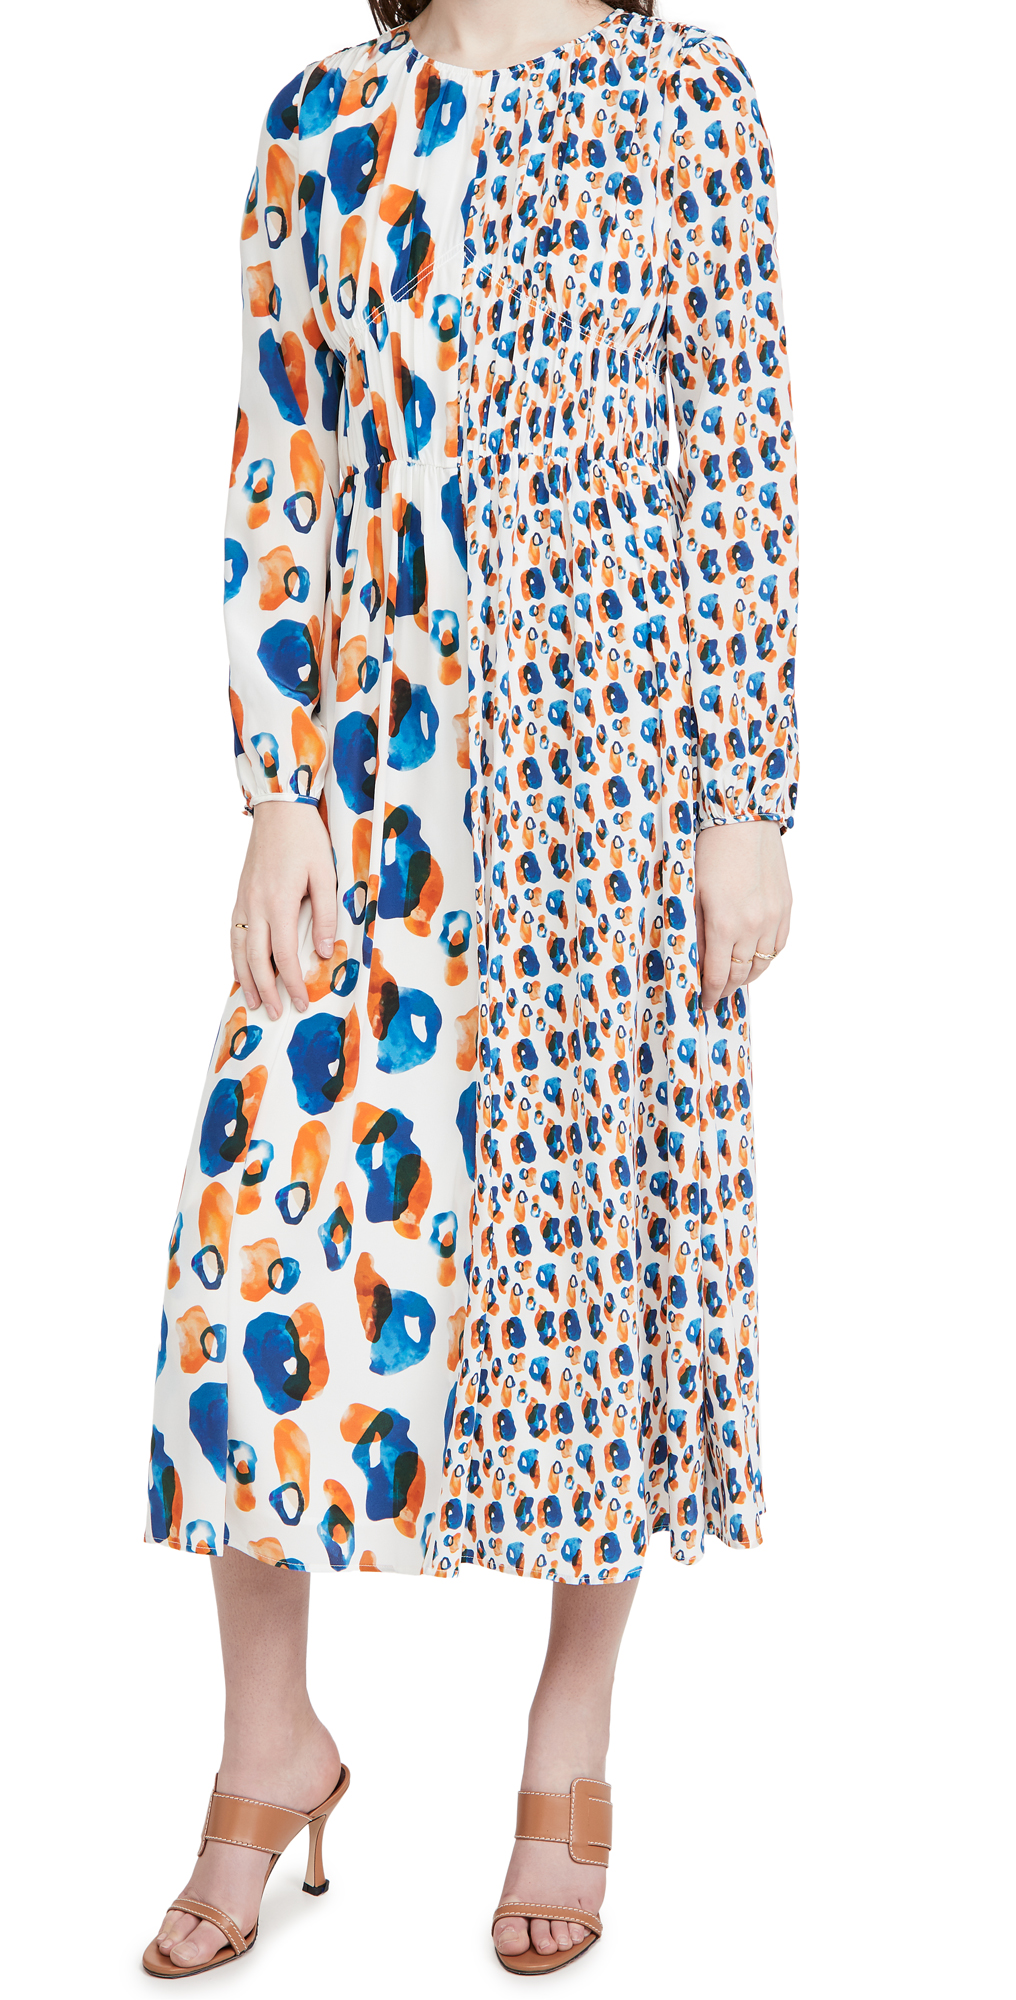 Jason Wu Silks DOUBLE PRINT COMBO LONG SLEEVE DRESS